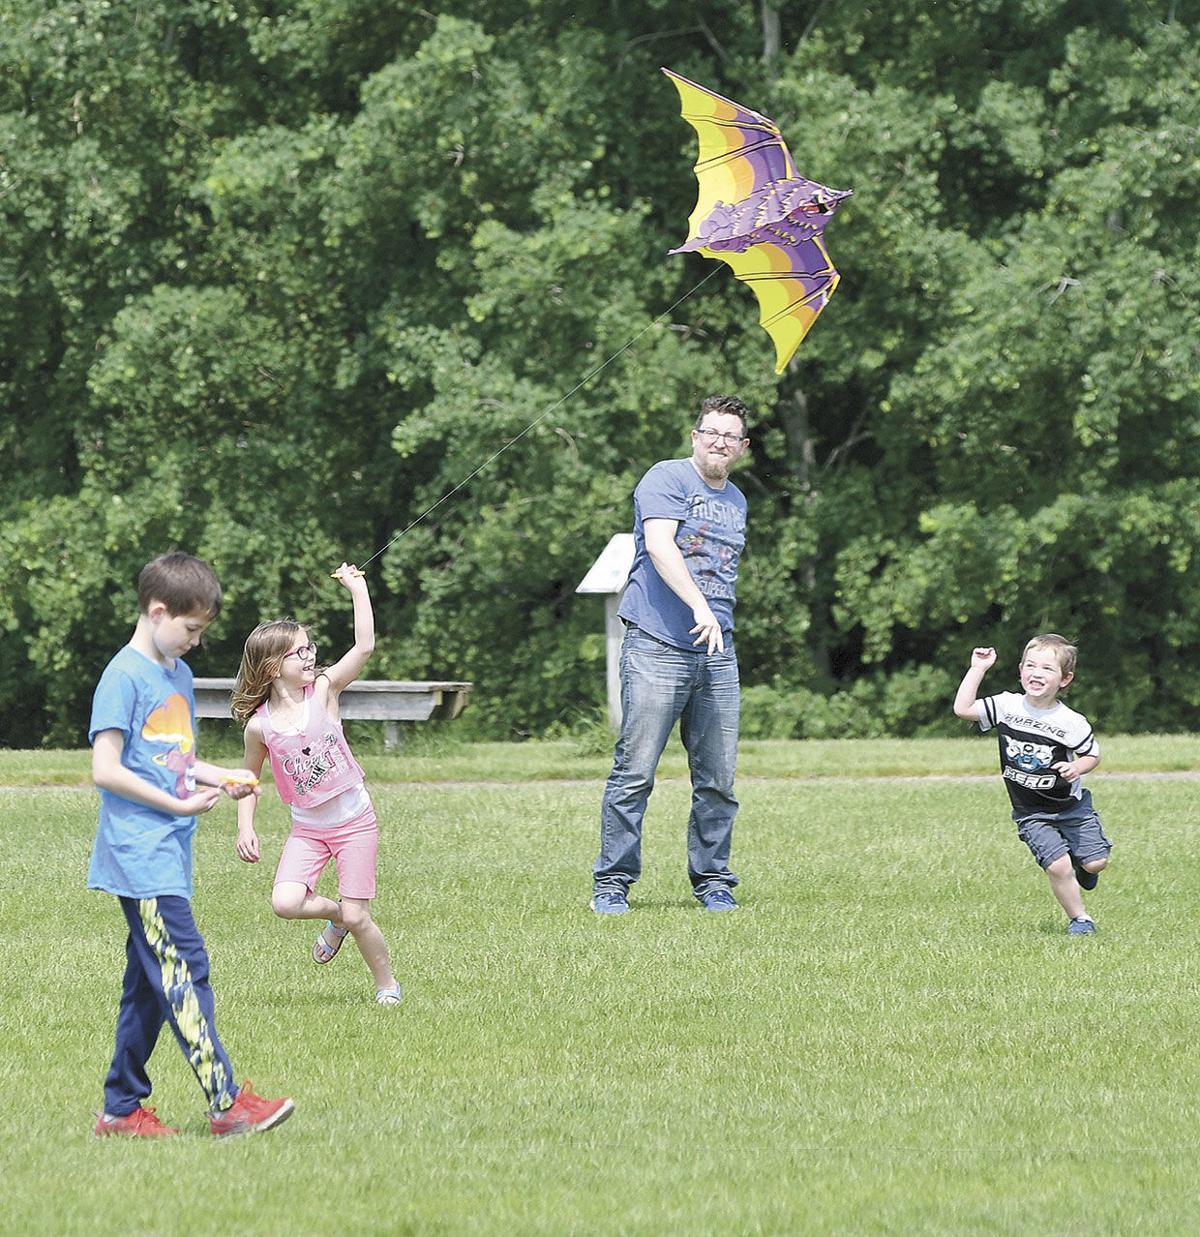 Free flying family fun